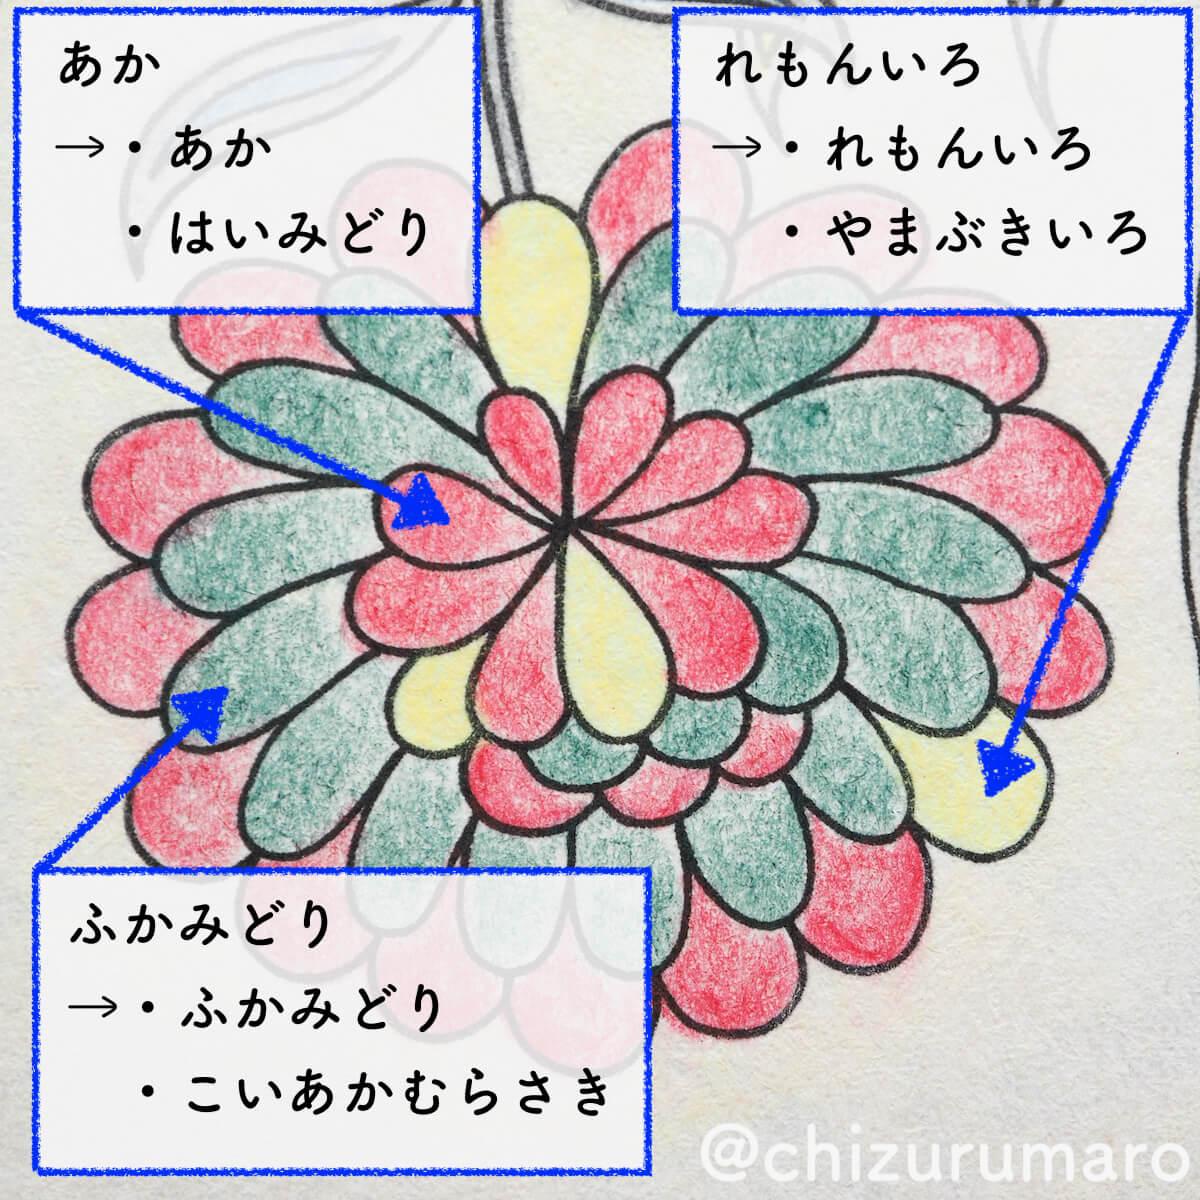 f:id:chizurumaro:20200511124215j:plain